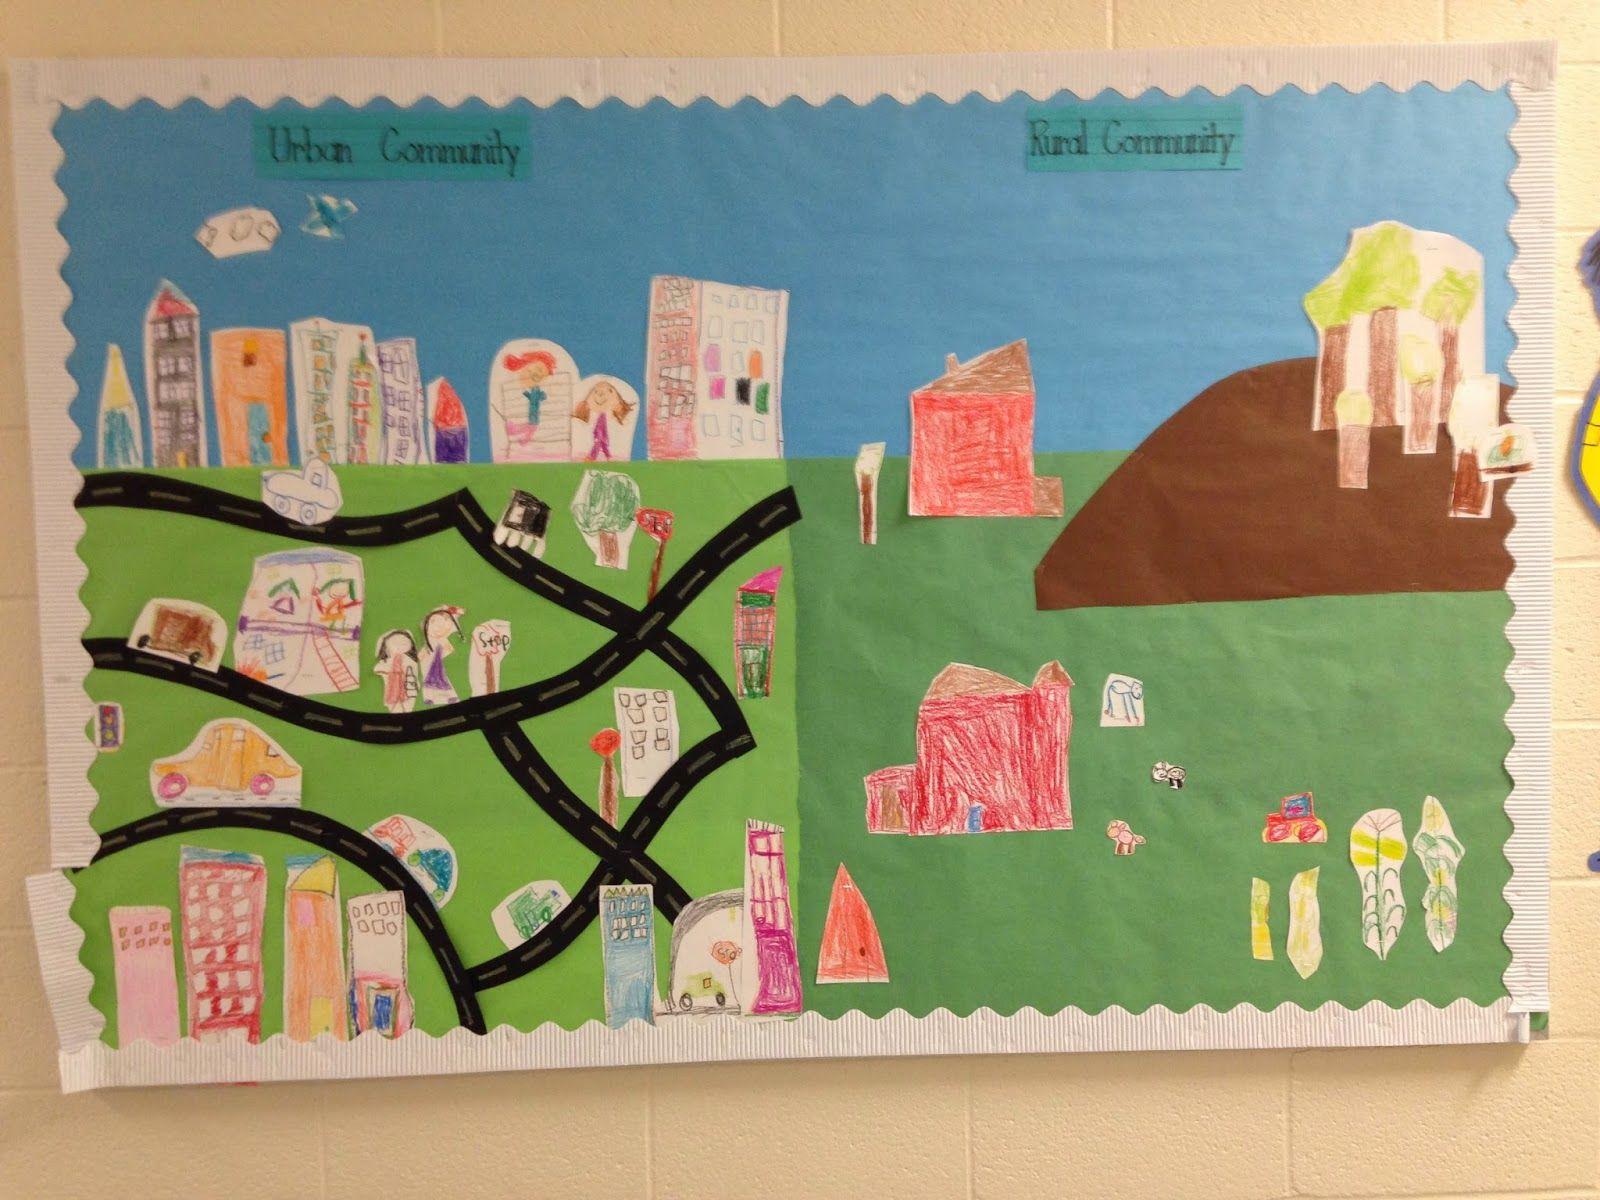 Urban Vs Rural Communities From Little Miss Glamour Goes To Kindergarten